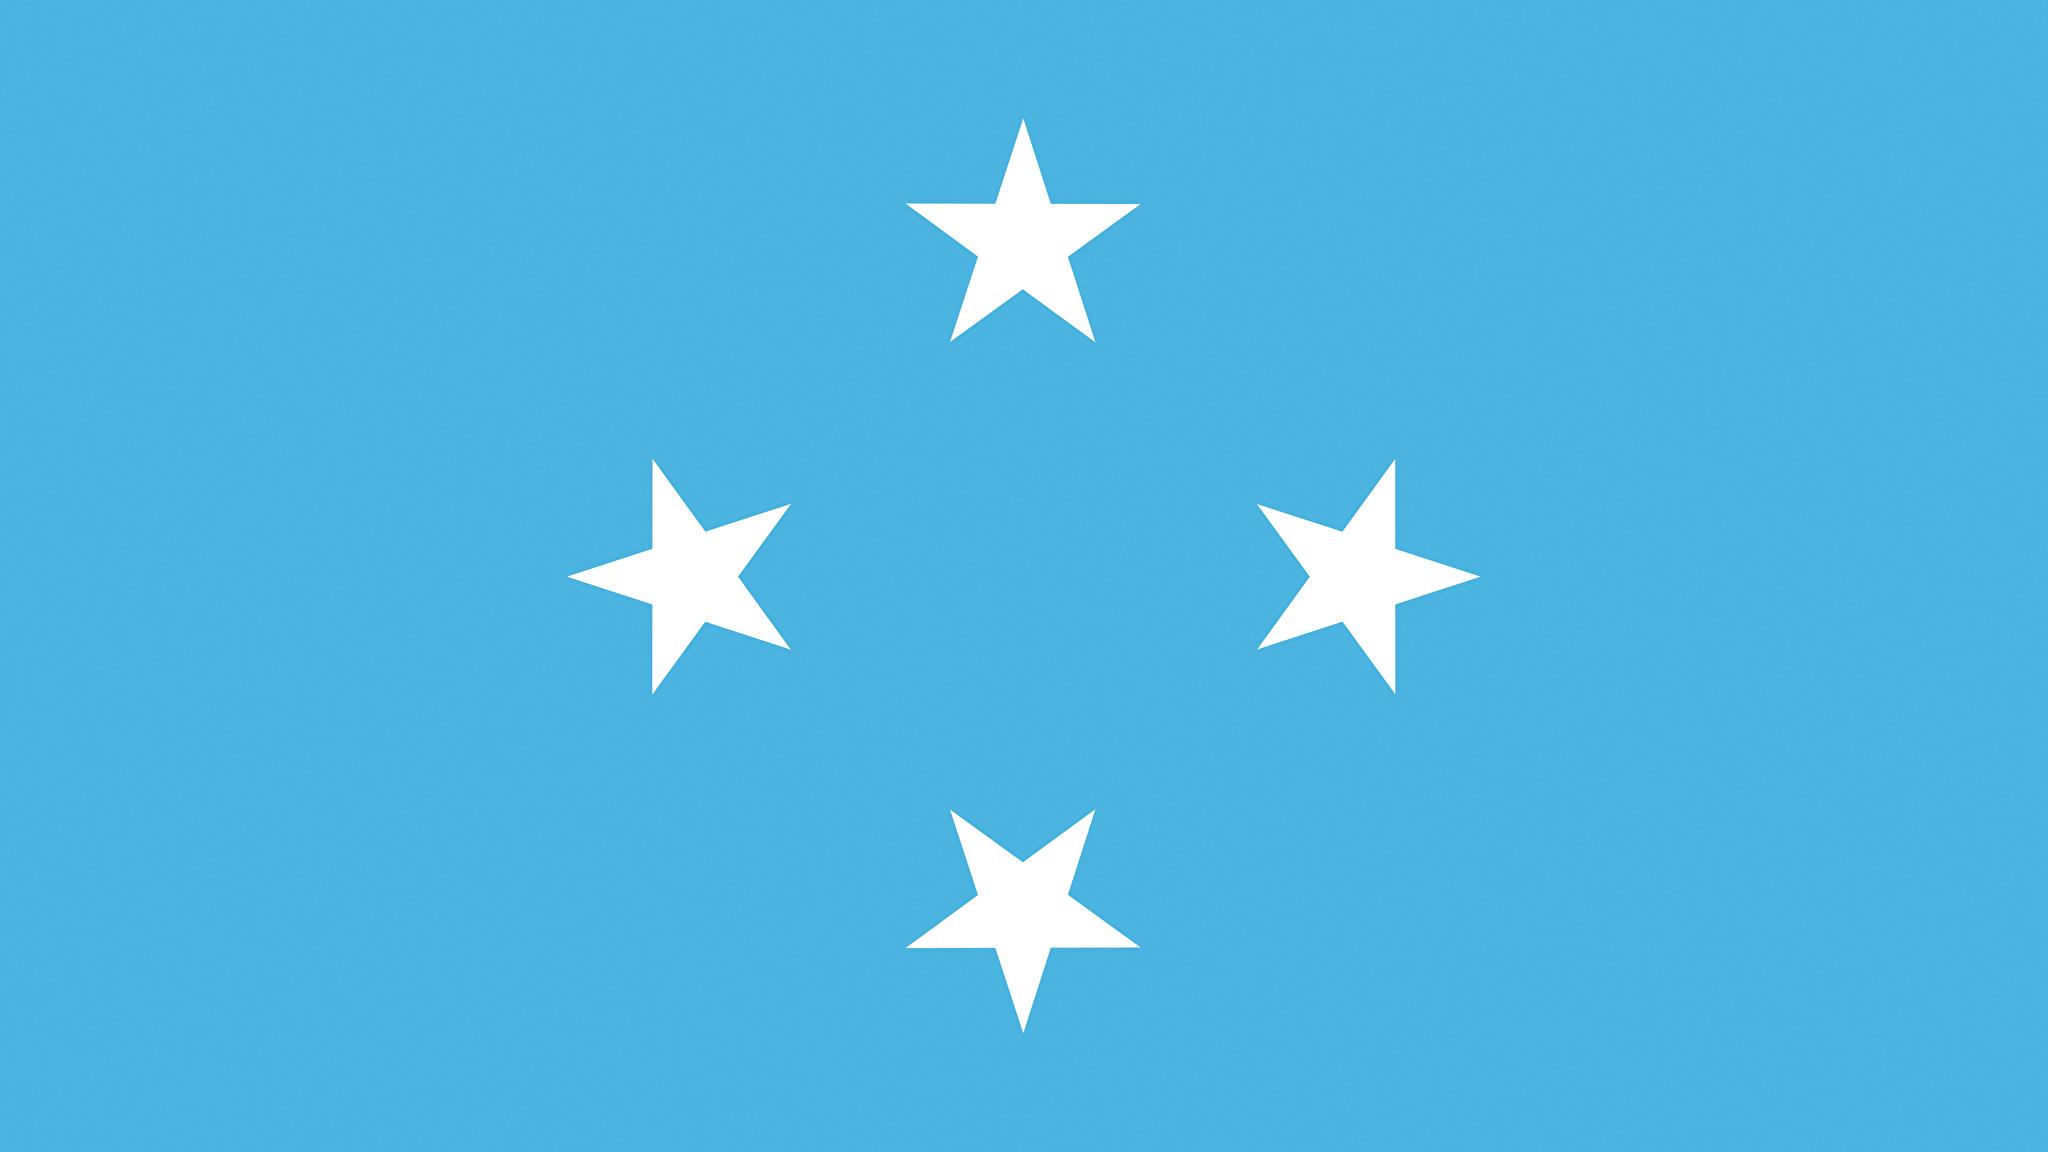 Photos Federated States of Micronesia Flag 2048x1152 2048x1152